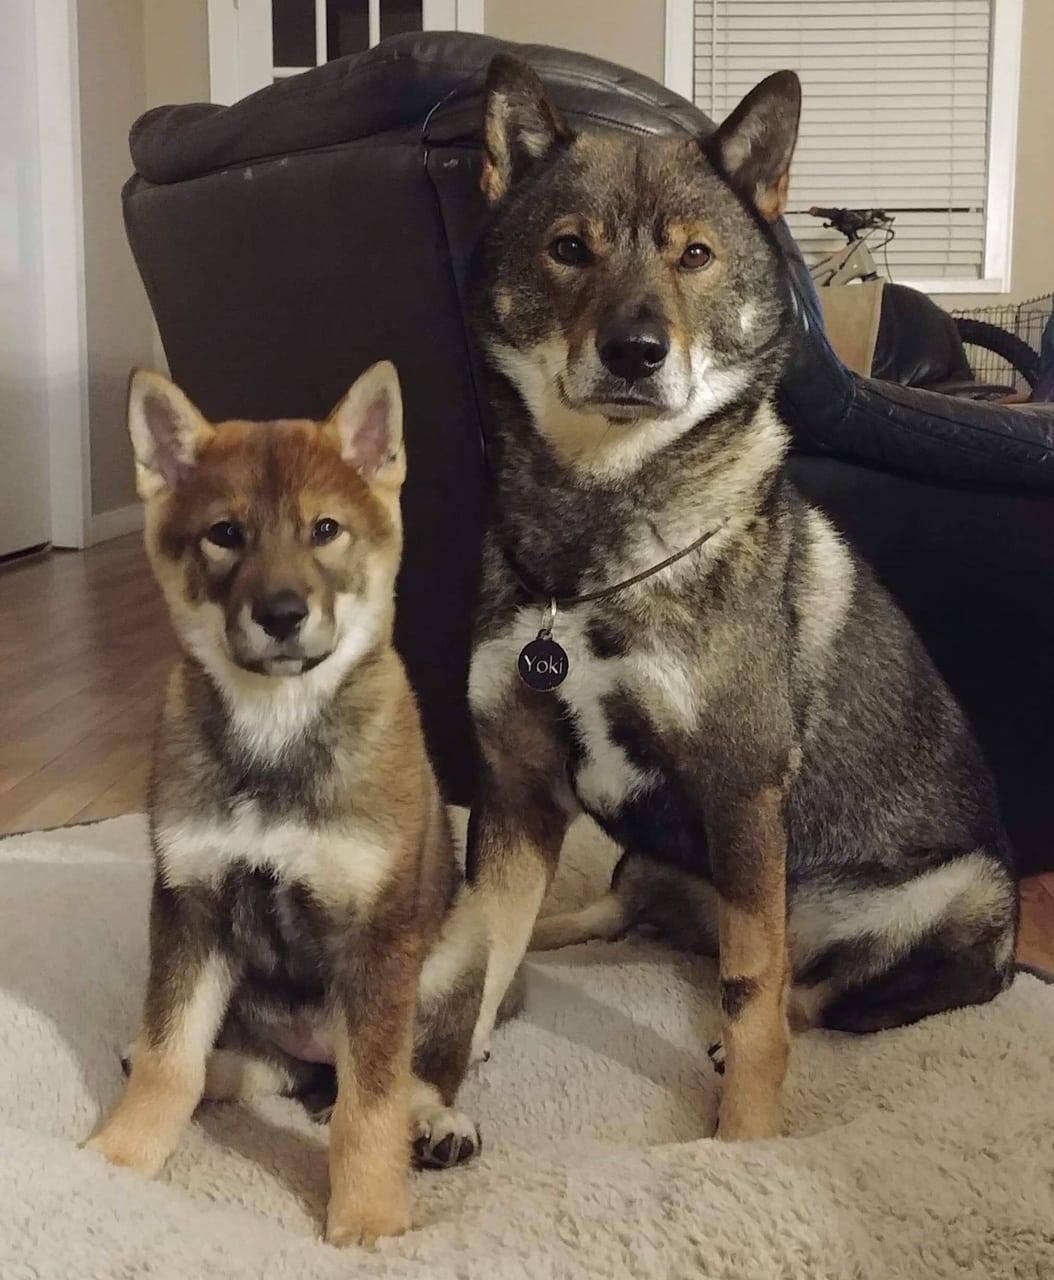 adult male shikoku sitting next to a 12 week old female shikoku puppy